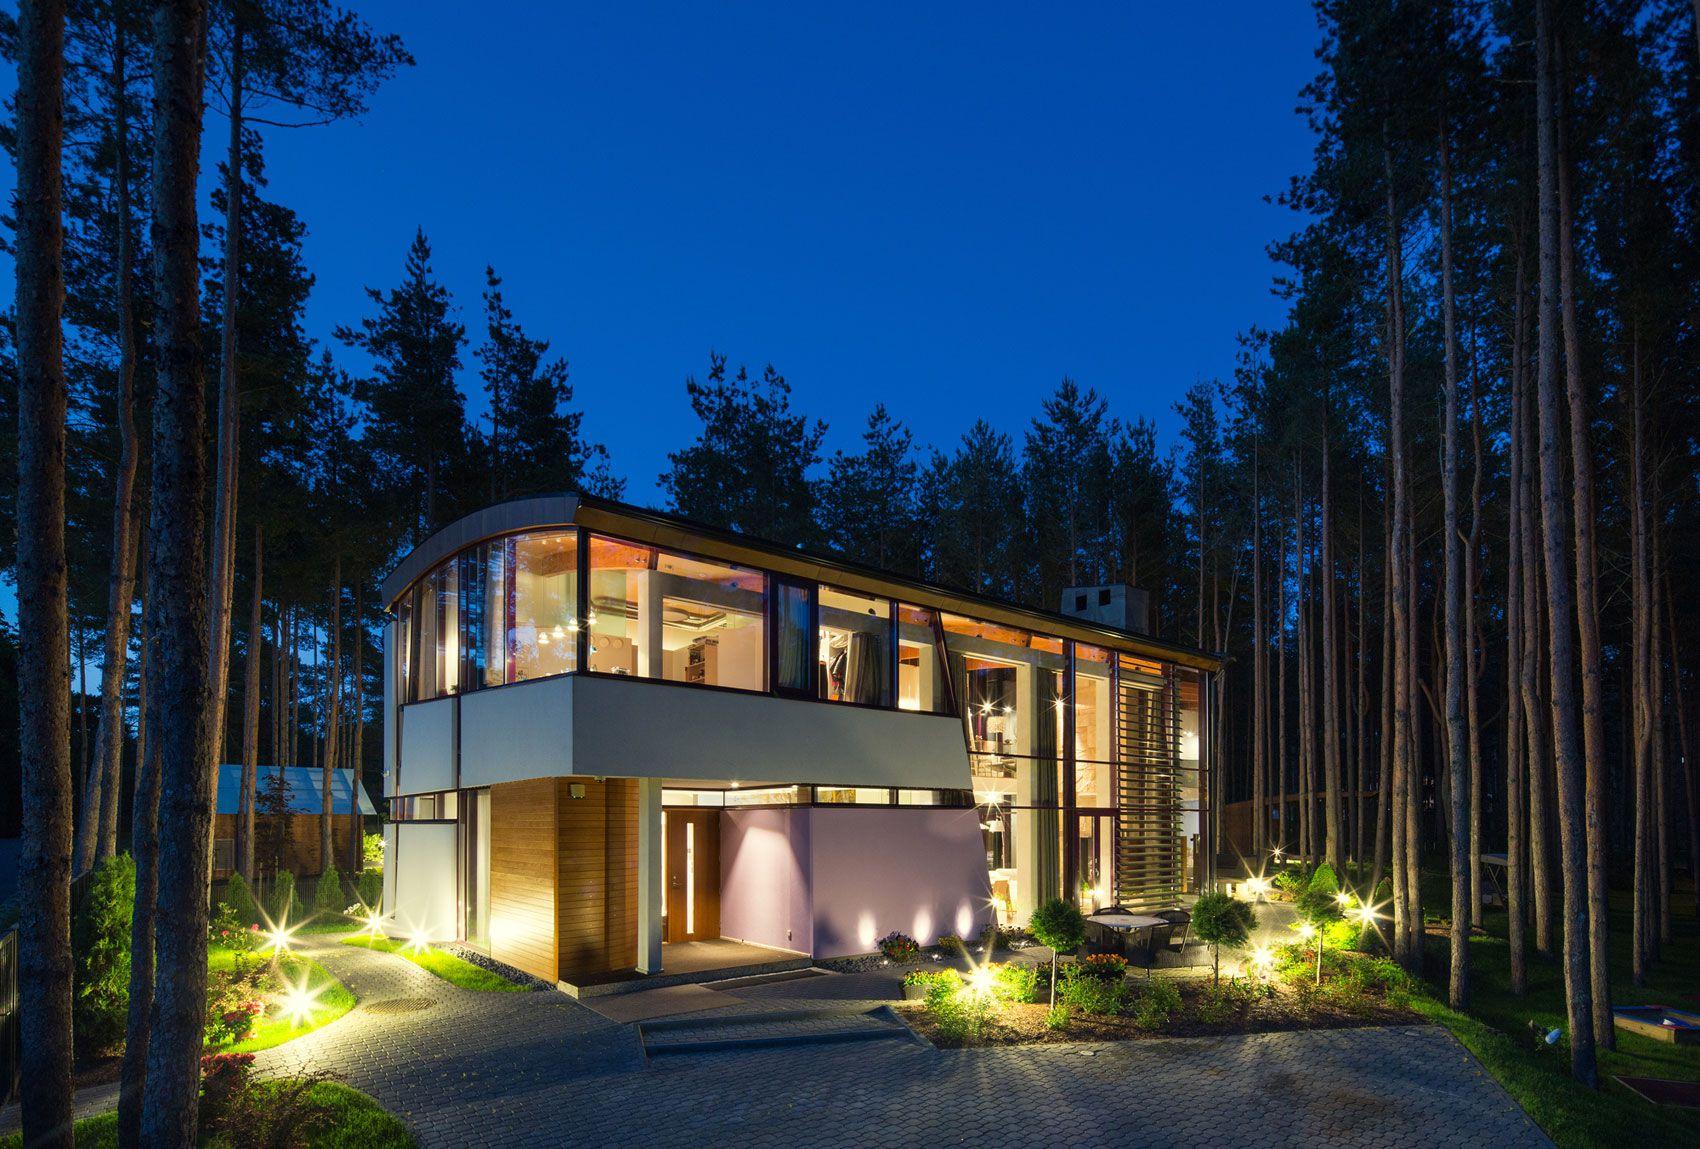 Ultramodern Villa Estebania Near the Forrest by Arch-D-19